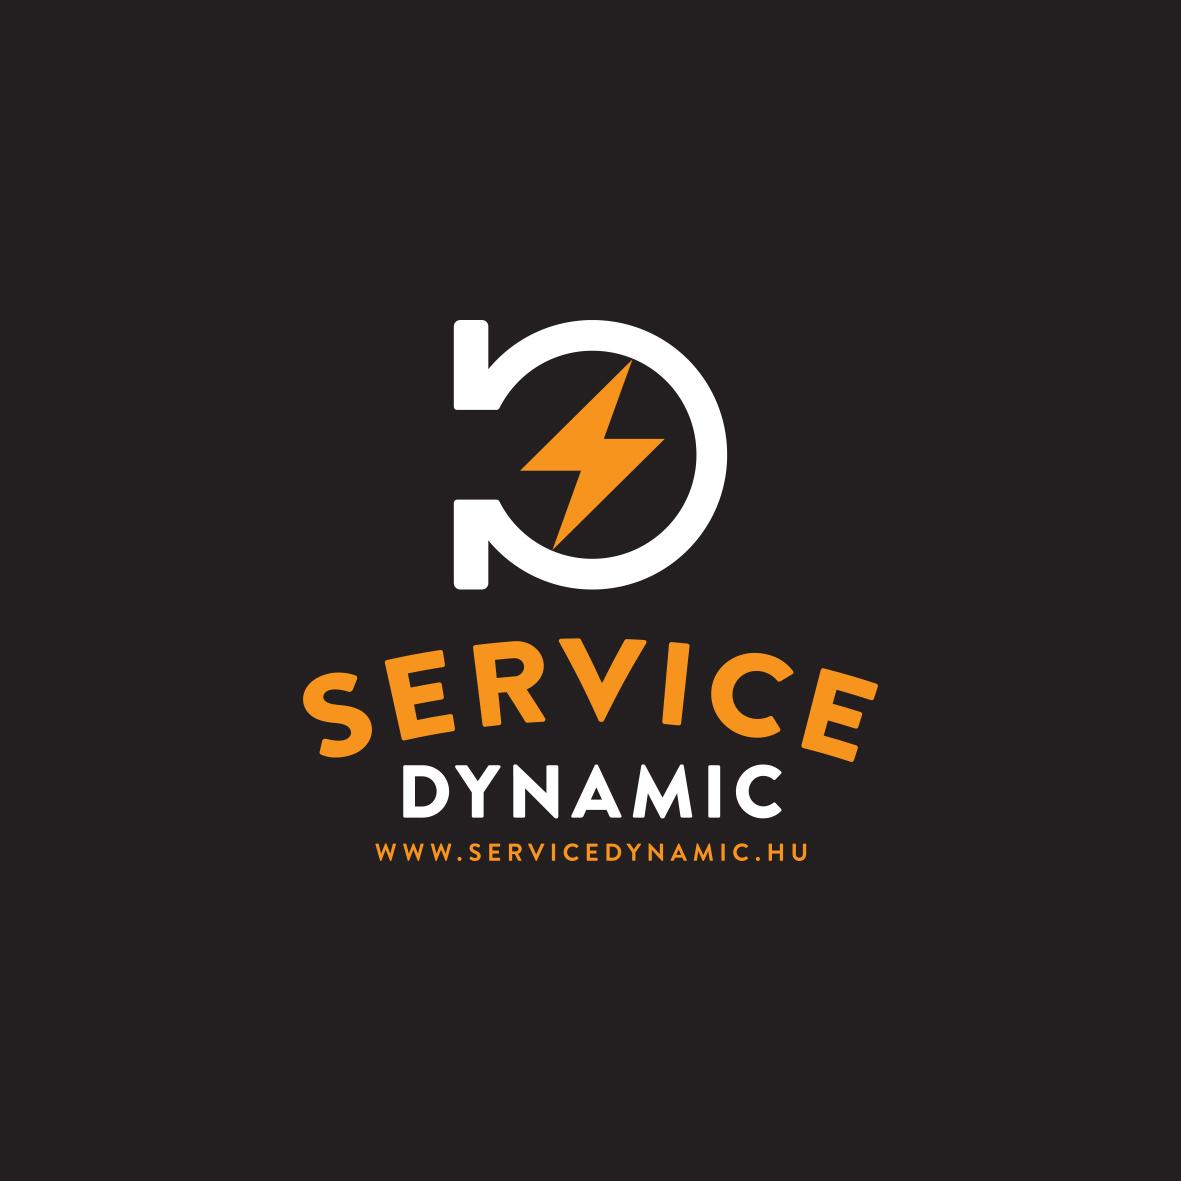 SERVICE DYNAMIC